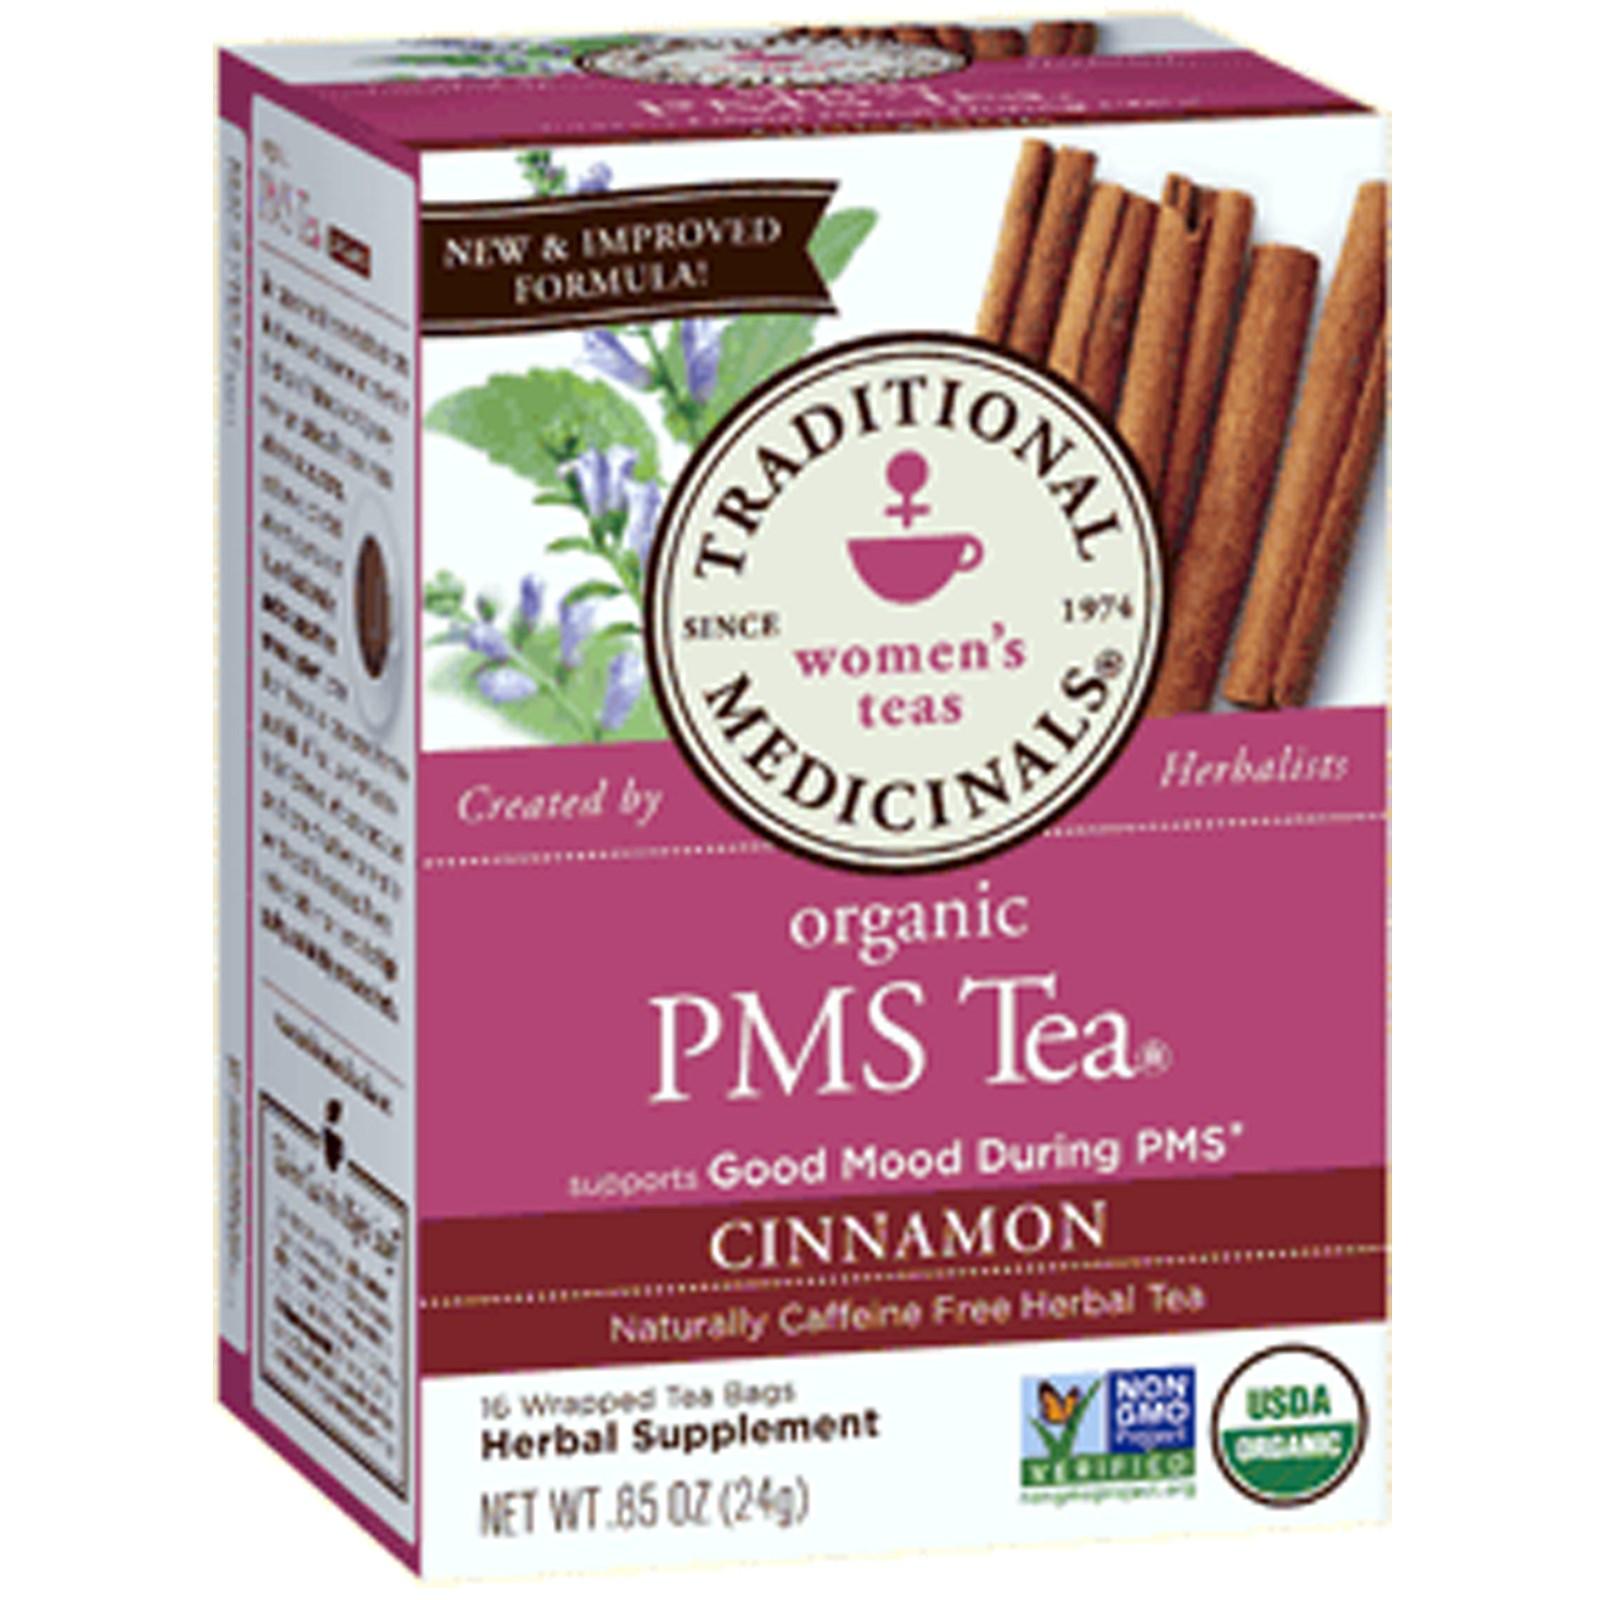 Traditional Medicinals, Women's Teas, Organic PMS Tea, Cinnamon.